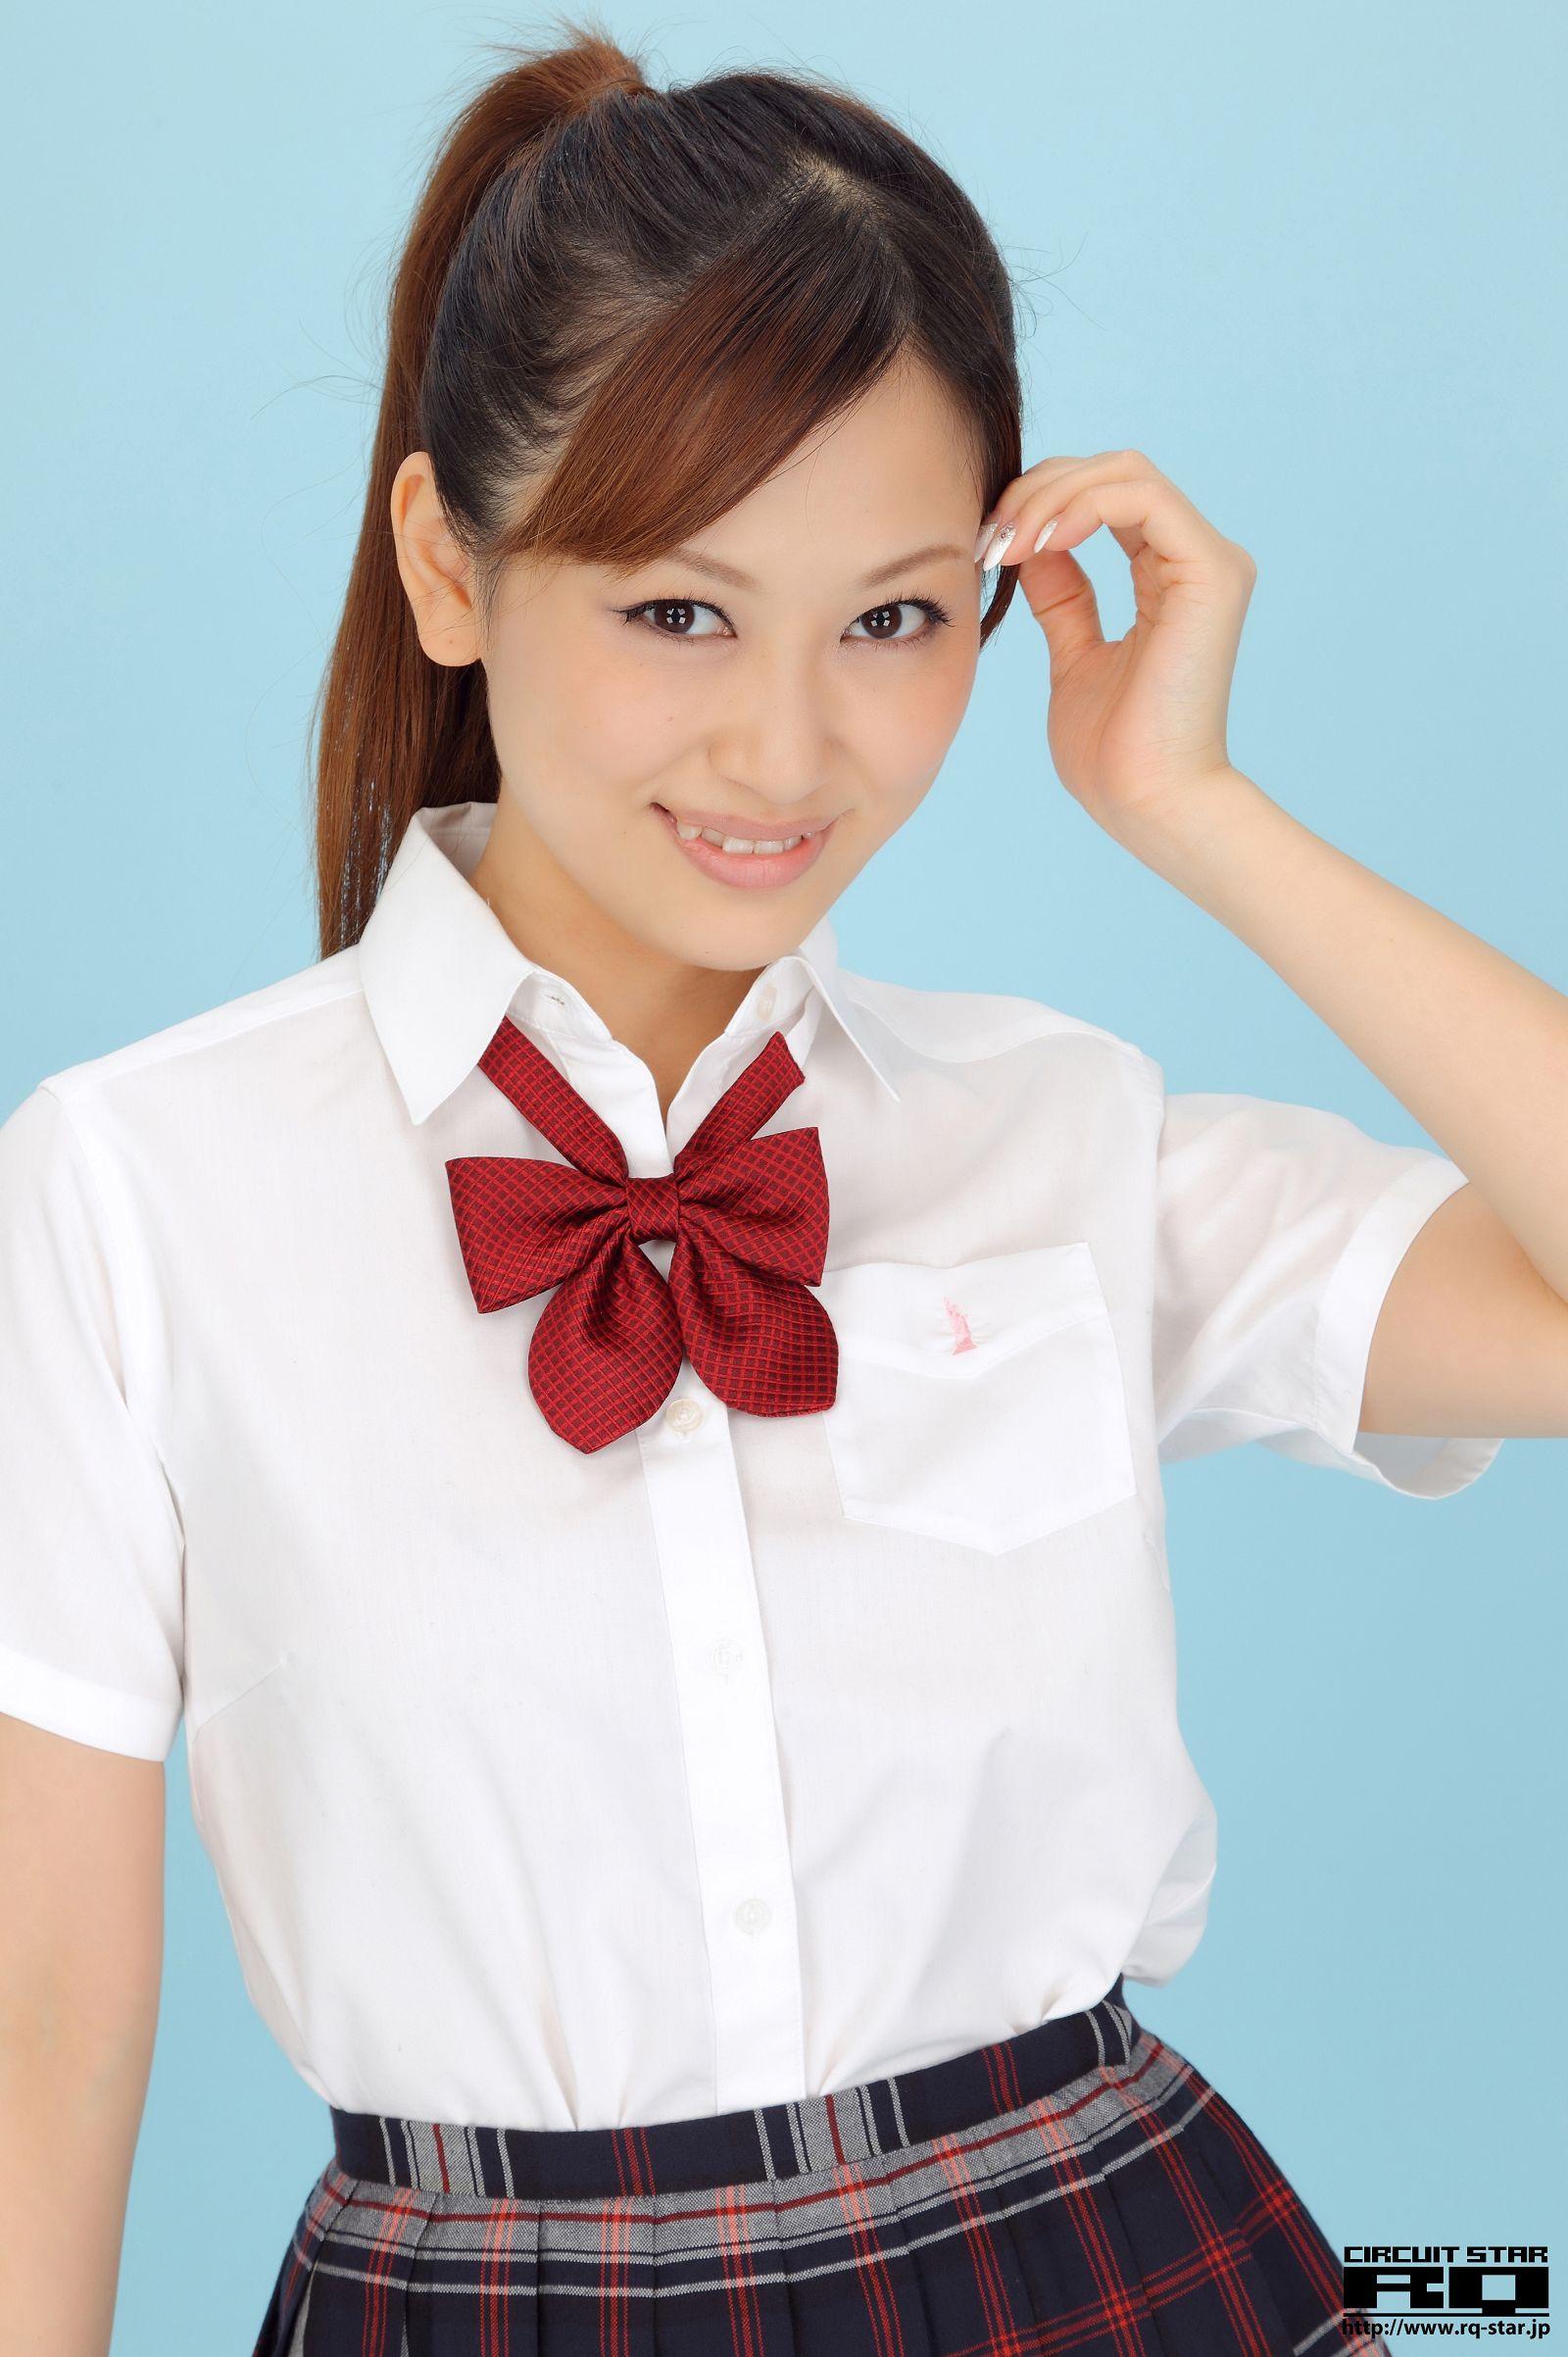 [RQ STAR美女] NO.00602 Chieri Aoba 青葉ちえり School Girl[150P] RQ STAR 第4张